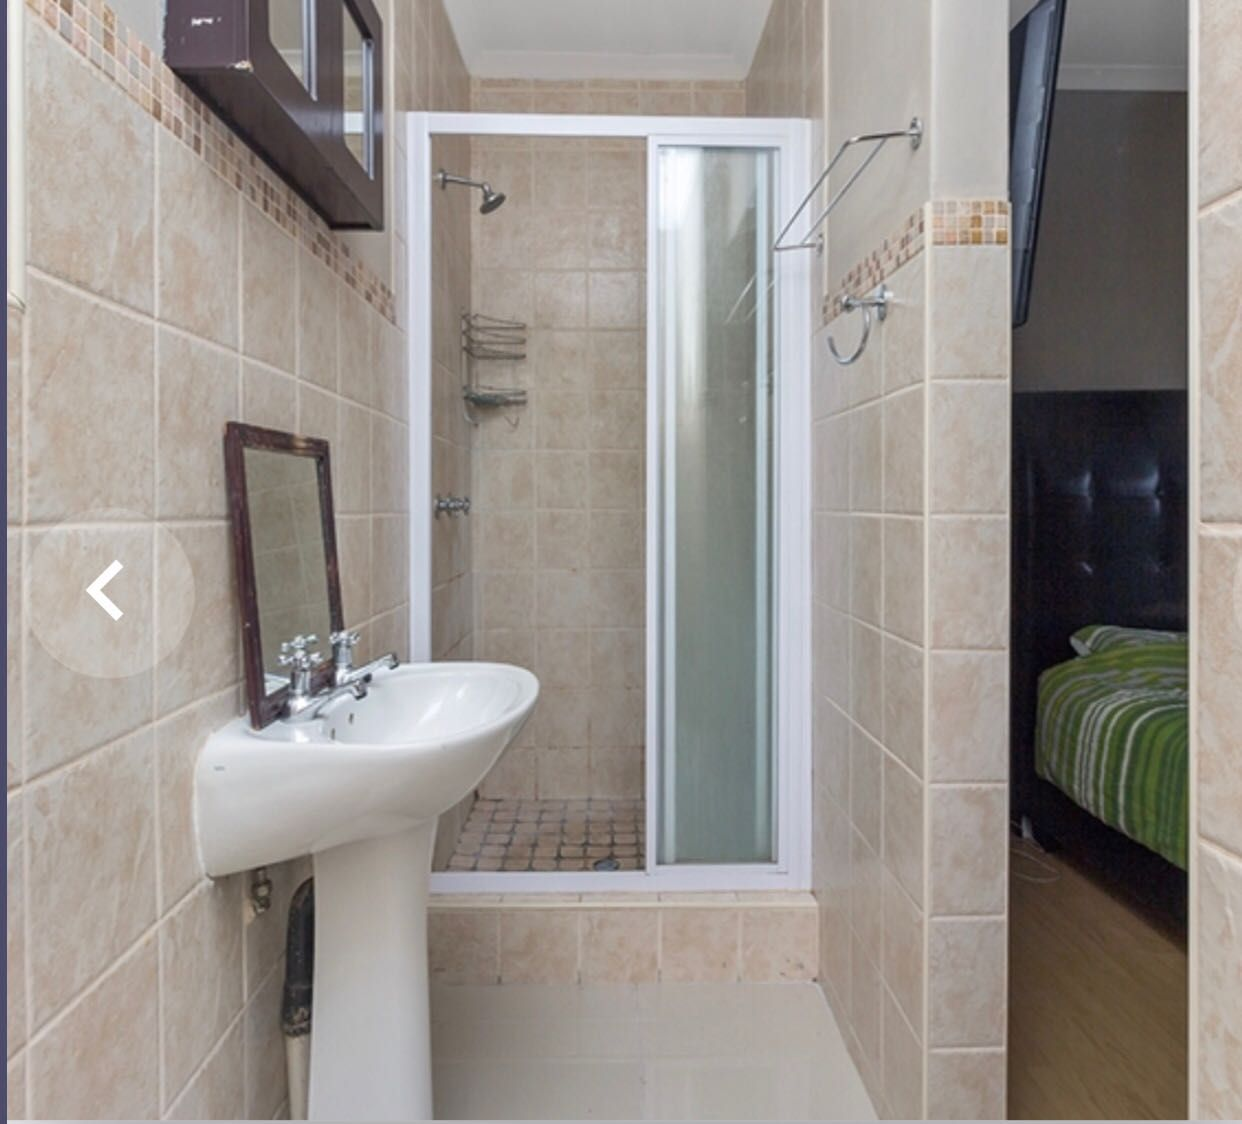 Brooklands Lifestyle Estate property for sale. Ref No: 13623361. Picture no 4